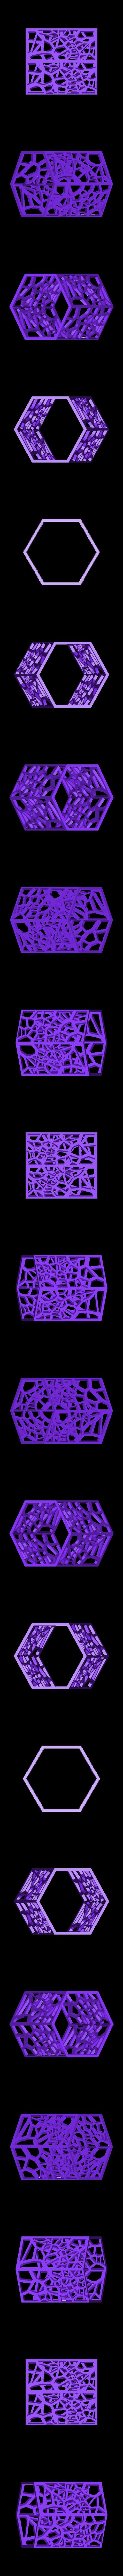 hexagonal-winerack-voronoi.stl Download free STL file Modular Wine Rack • 3D printer object, O3D